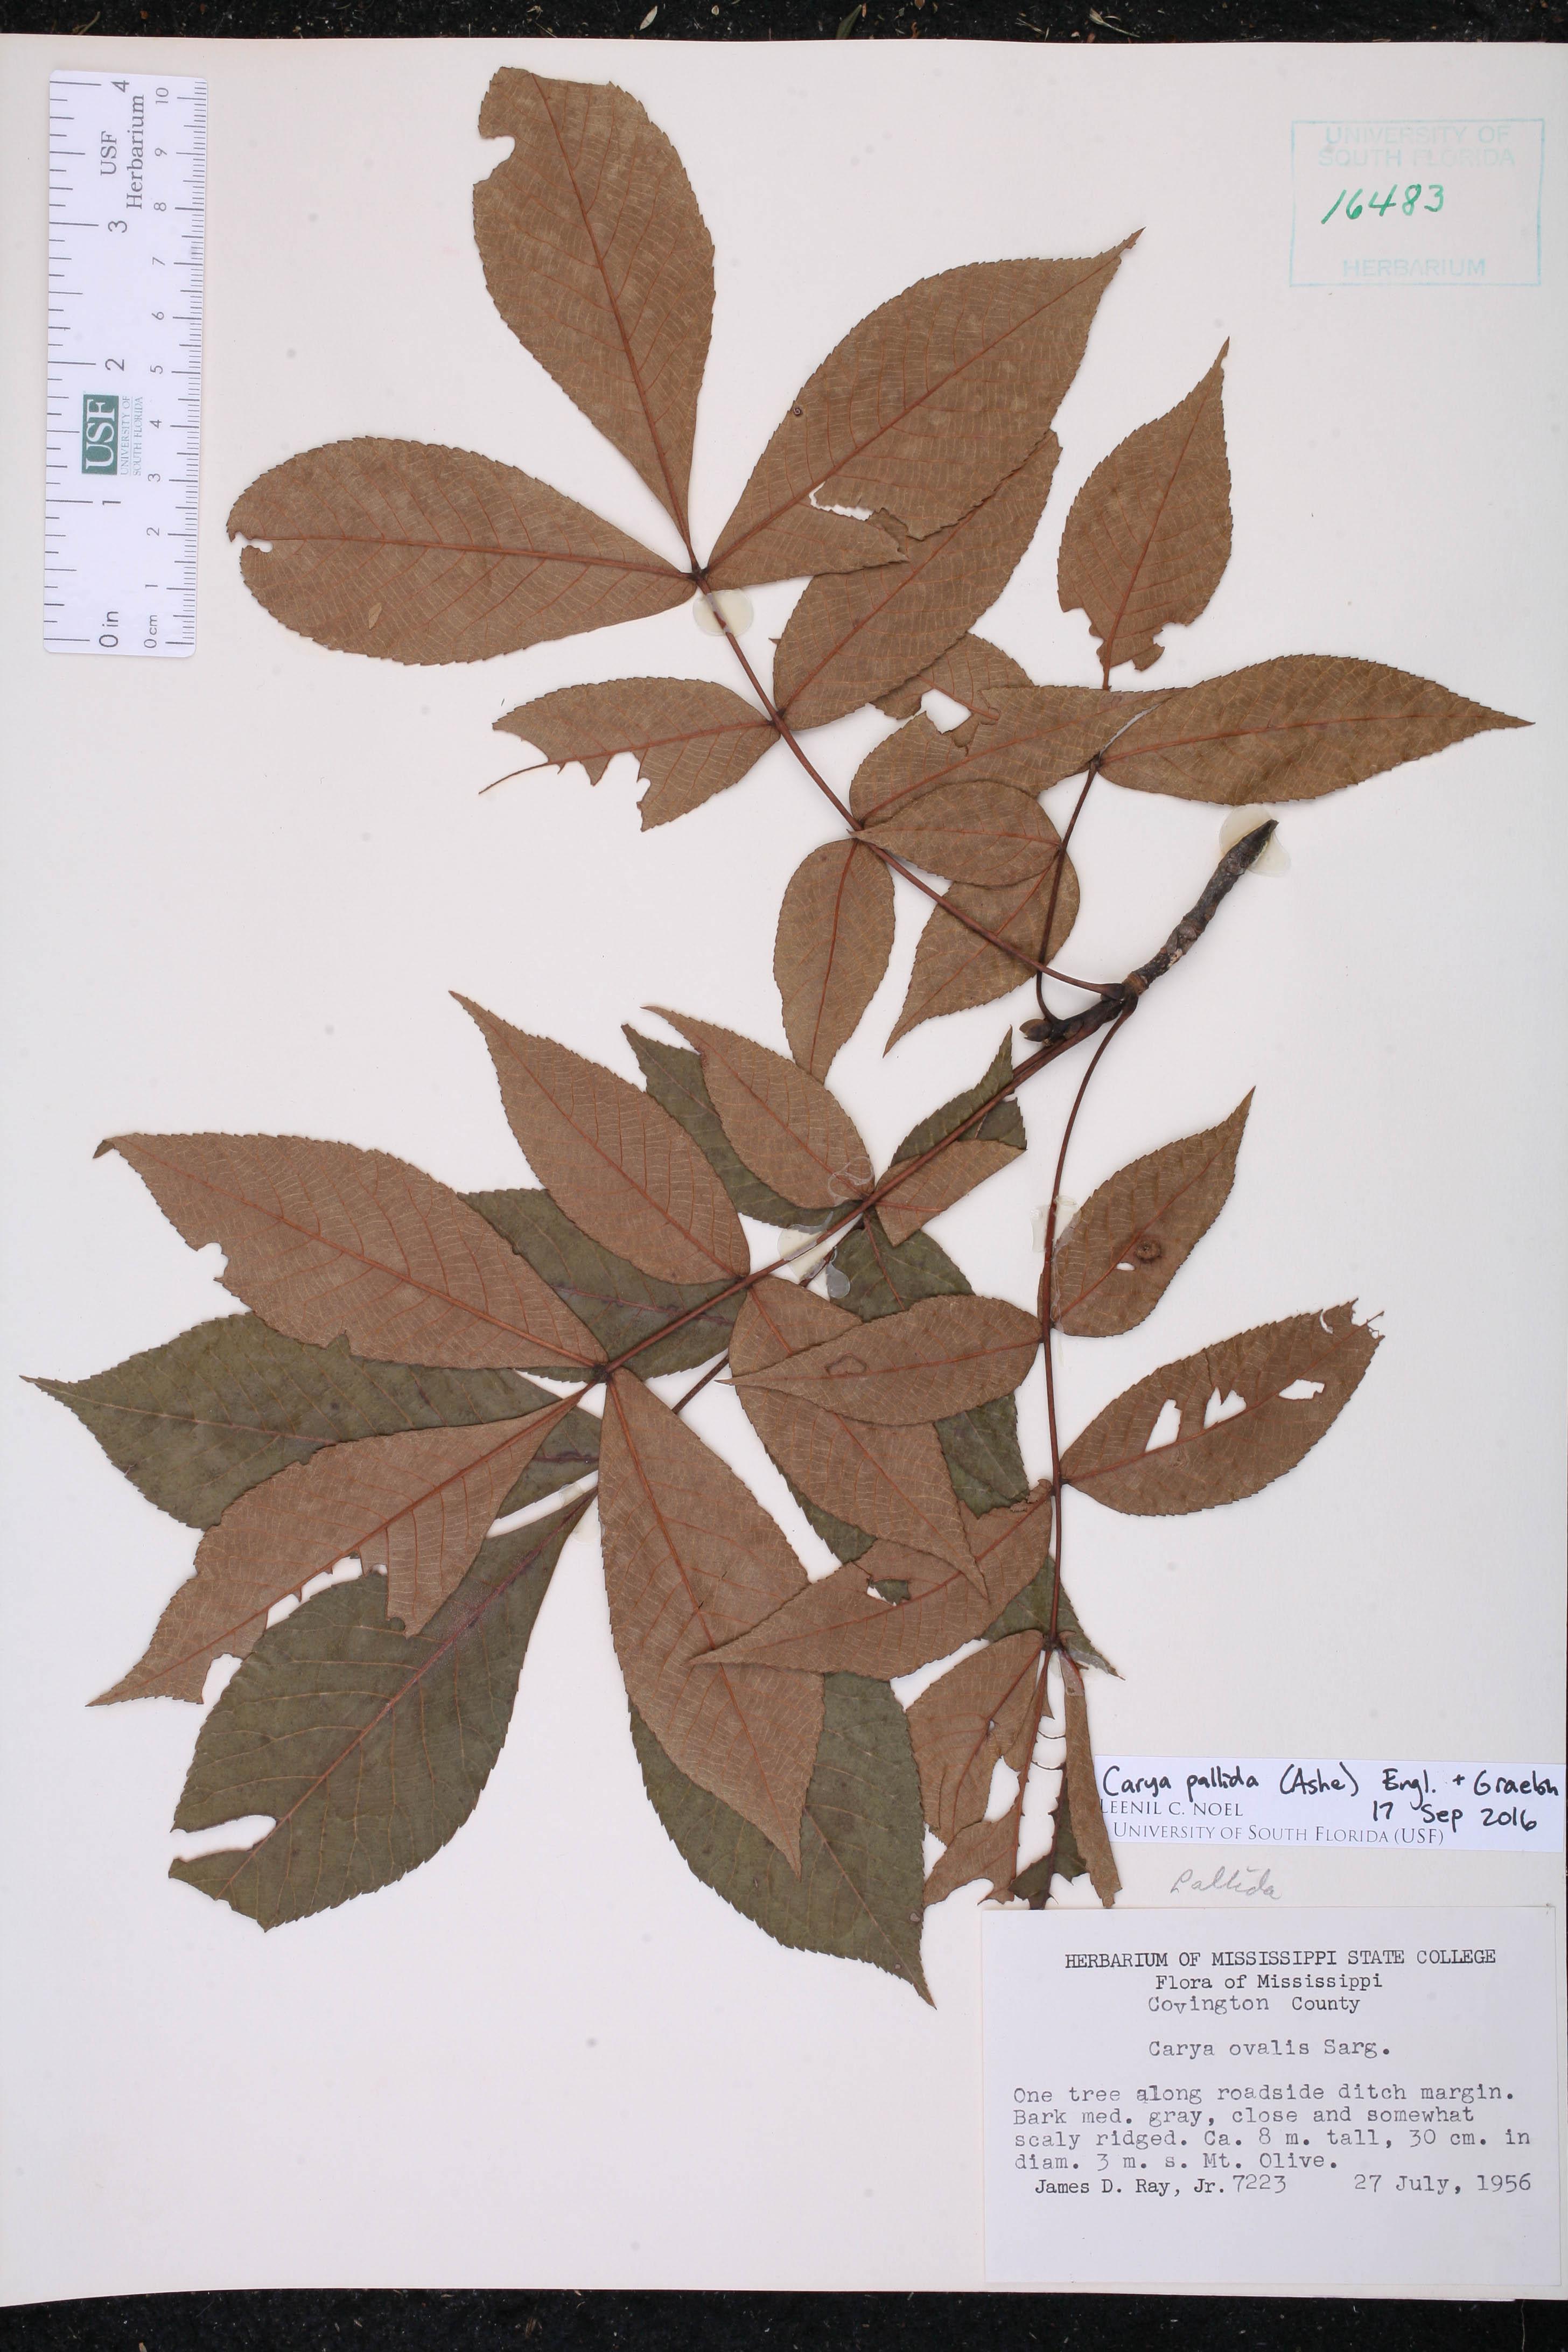 Carya pallida - Species Page - ISB: Atlas of Florida Plants